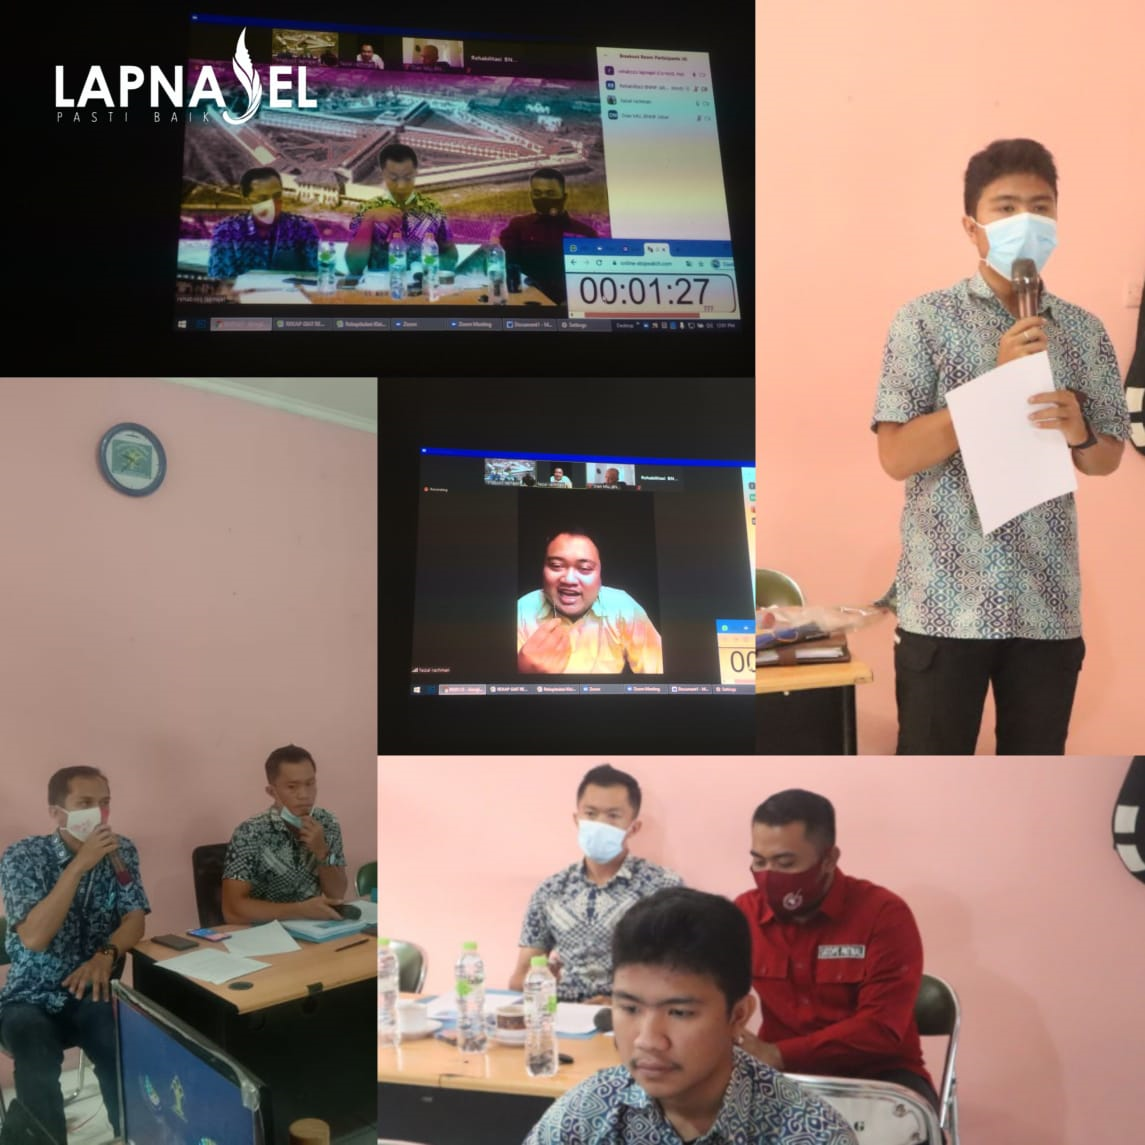 Lapas Narkotika Bandung Rekrut 8 orang Konselor Adiksi untuk Rehabilitasi Pecandu Napza